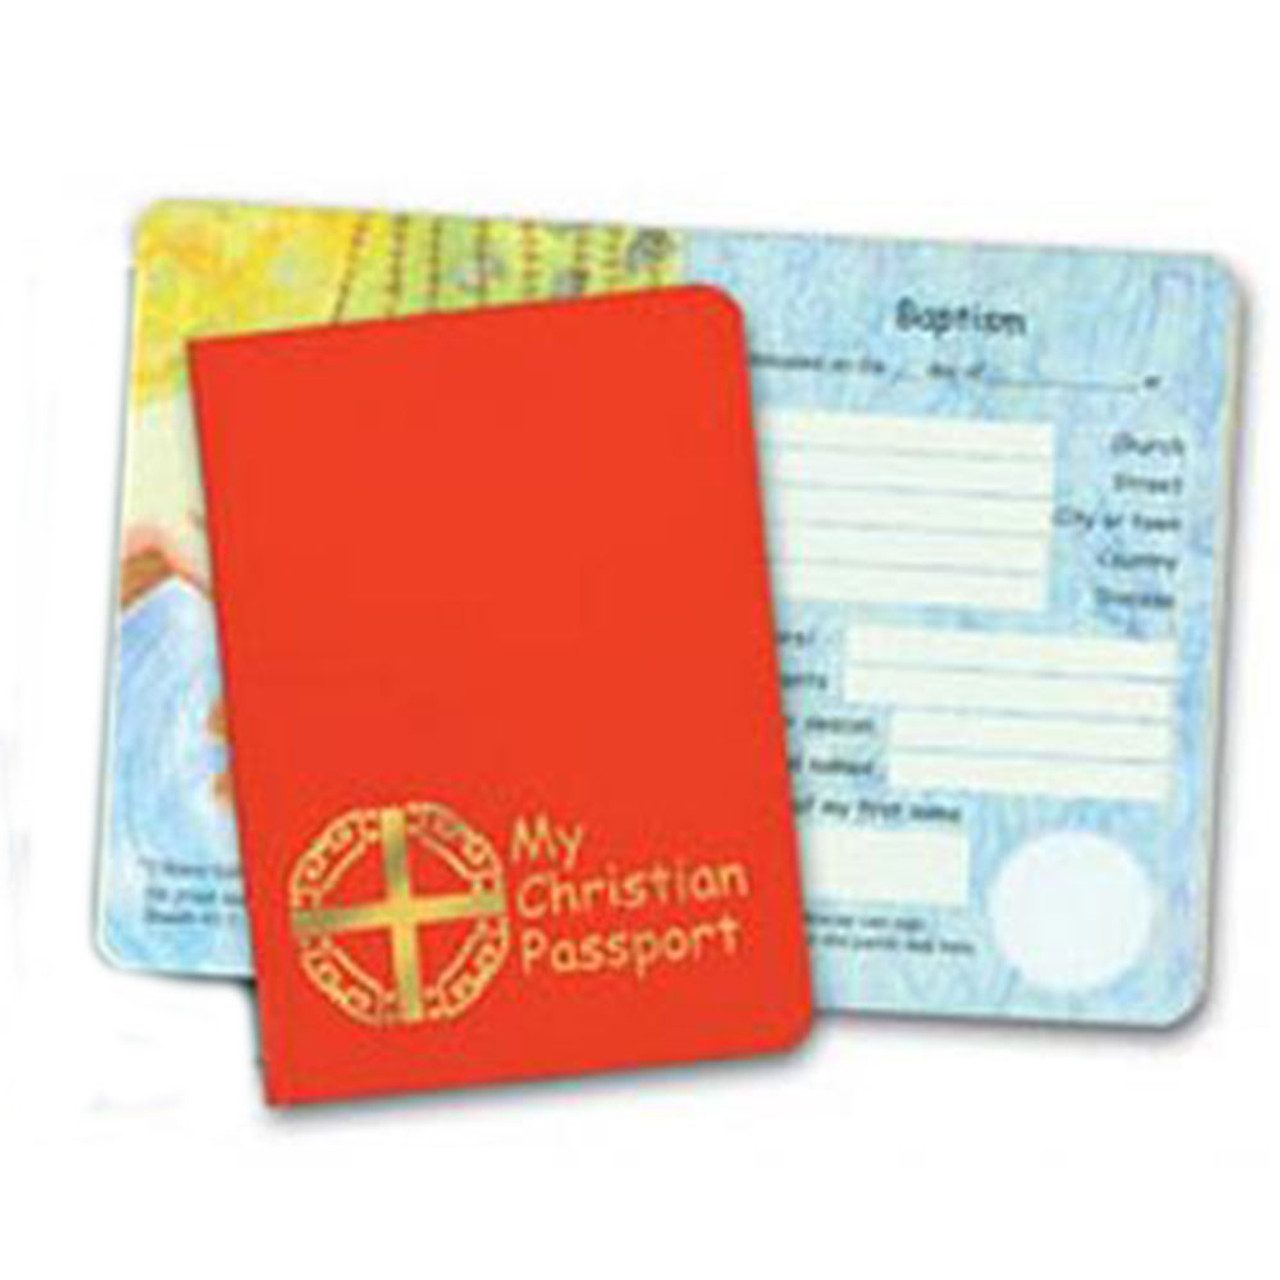 My Christian Passport